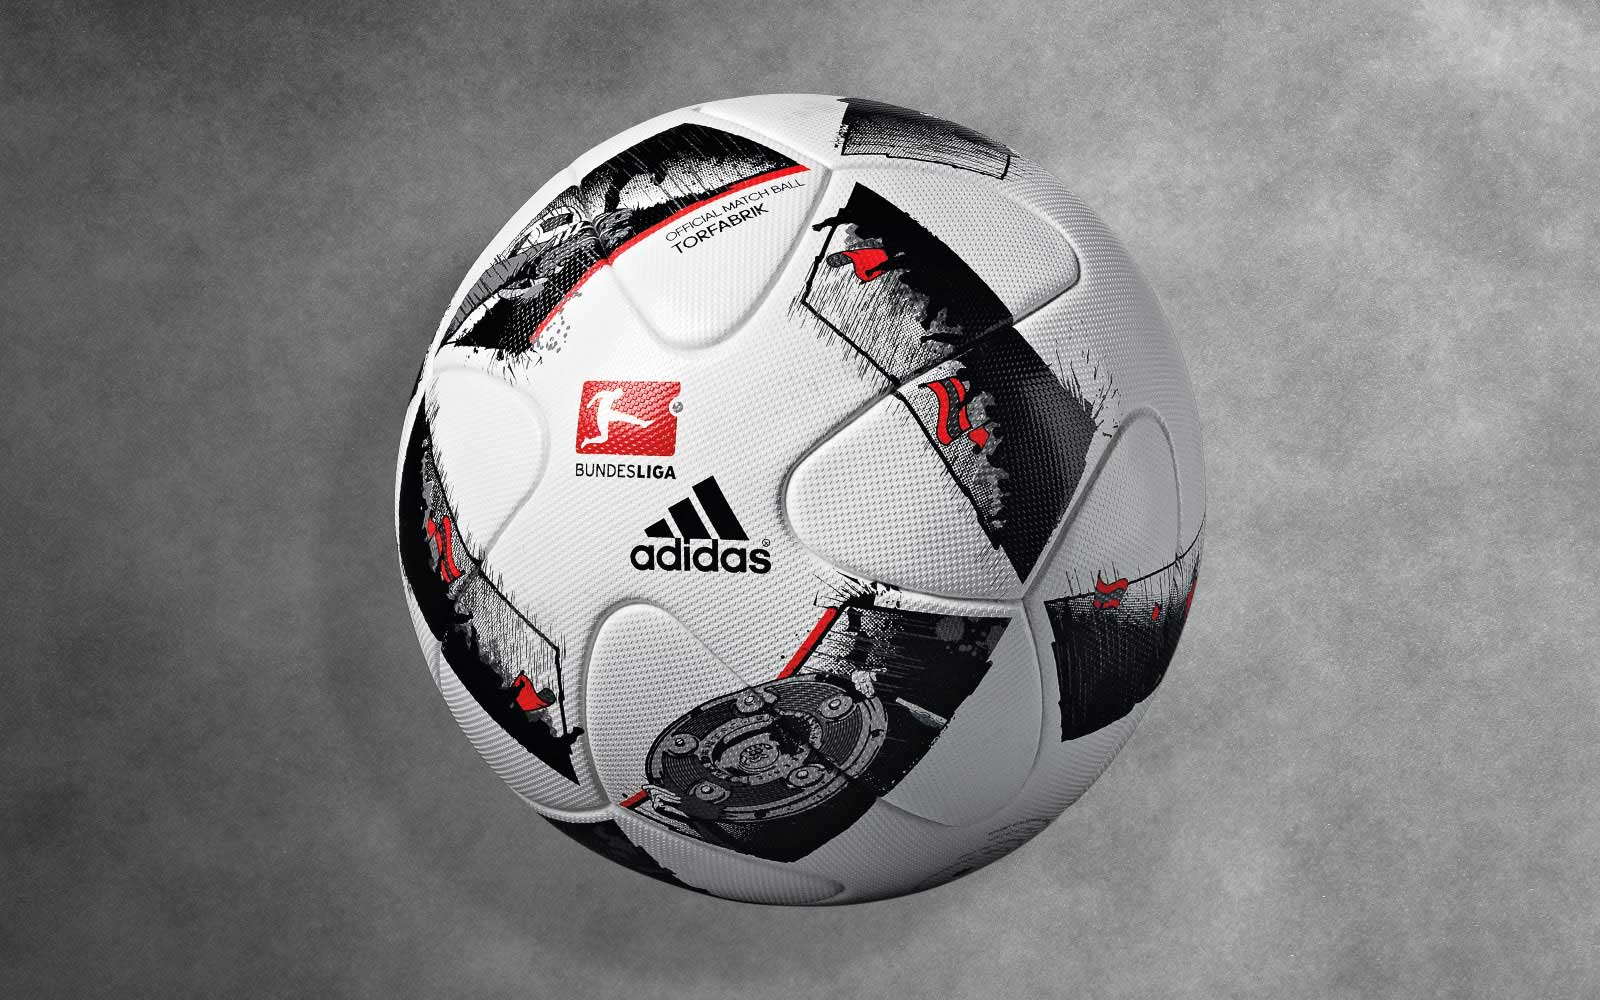 Adidas torfrabik 16 17 bundesliga ball released footy for Bundesliga videos